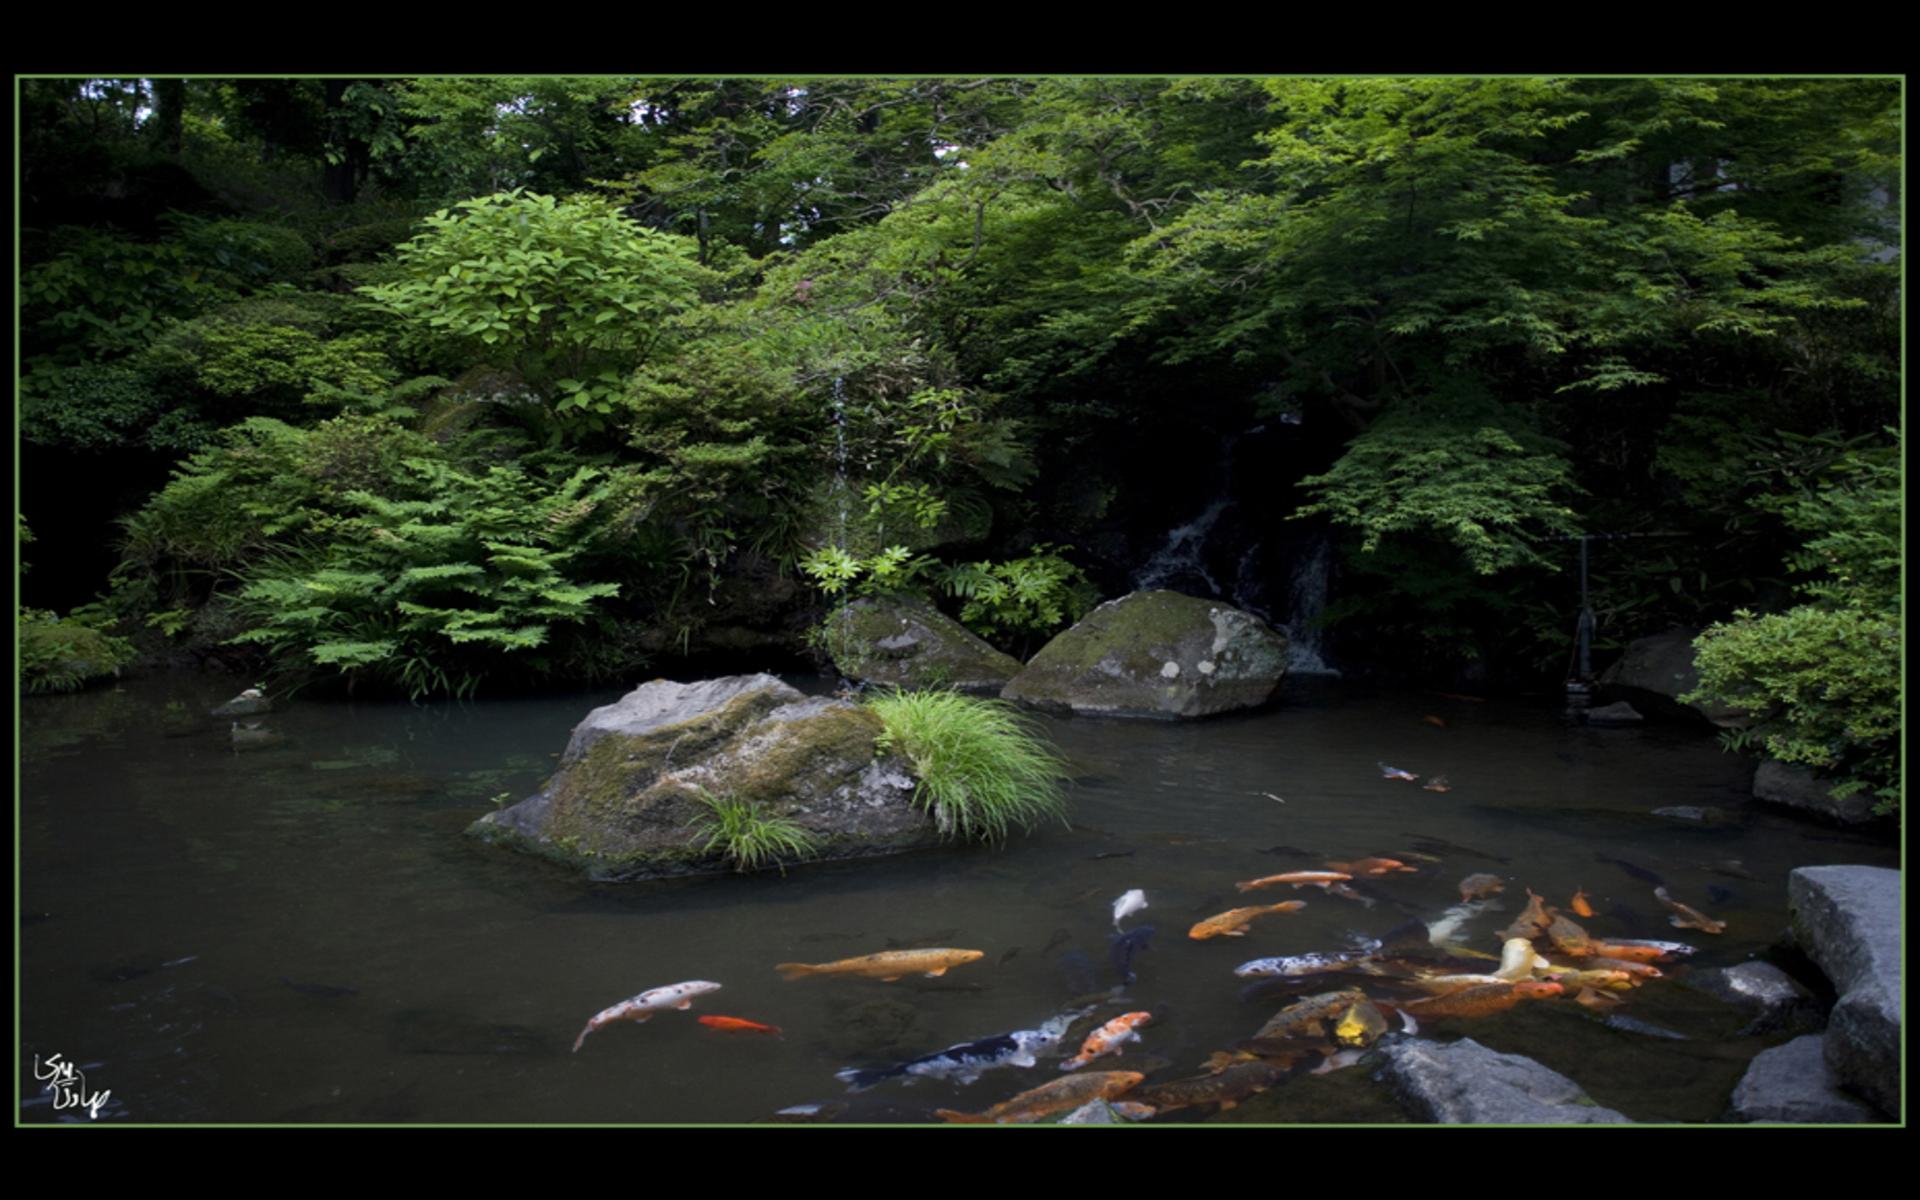 hdwpaperscombeautiful japanese garden wallpaper wallpapershtml 1920x1200